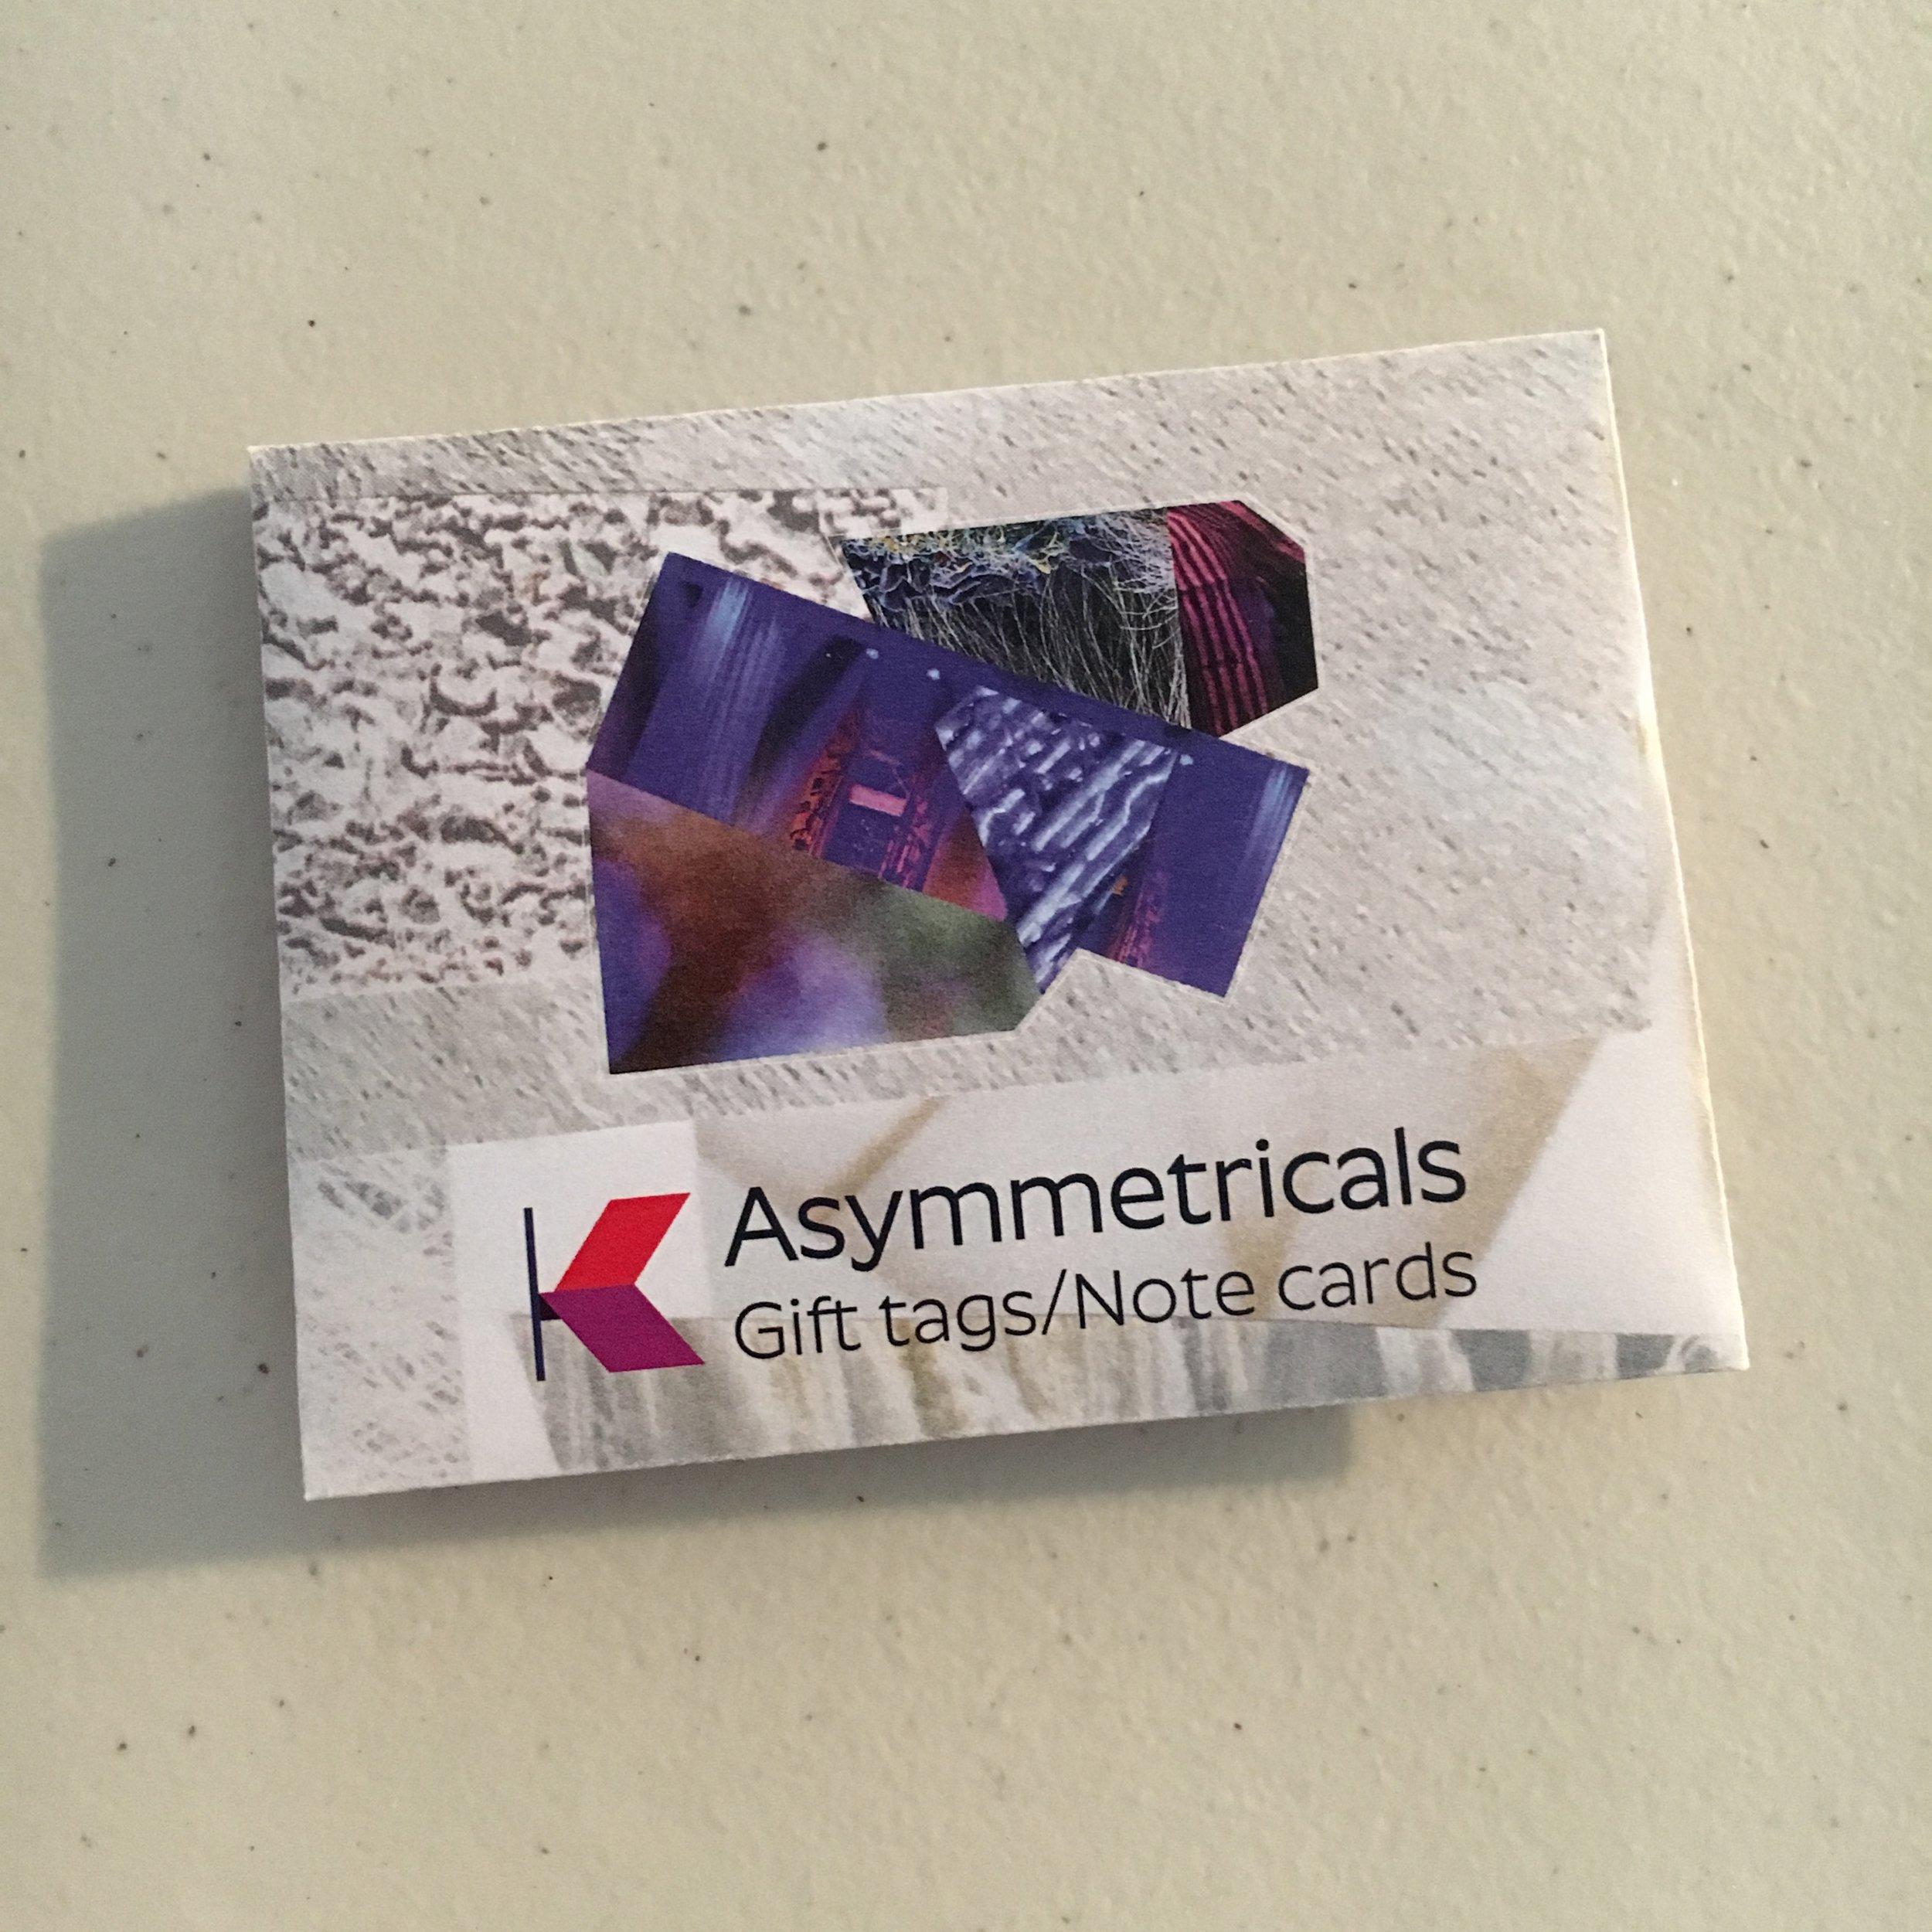 Asymmetrical 24 pack front.JPG